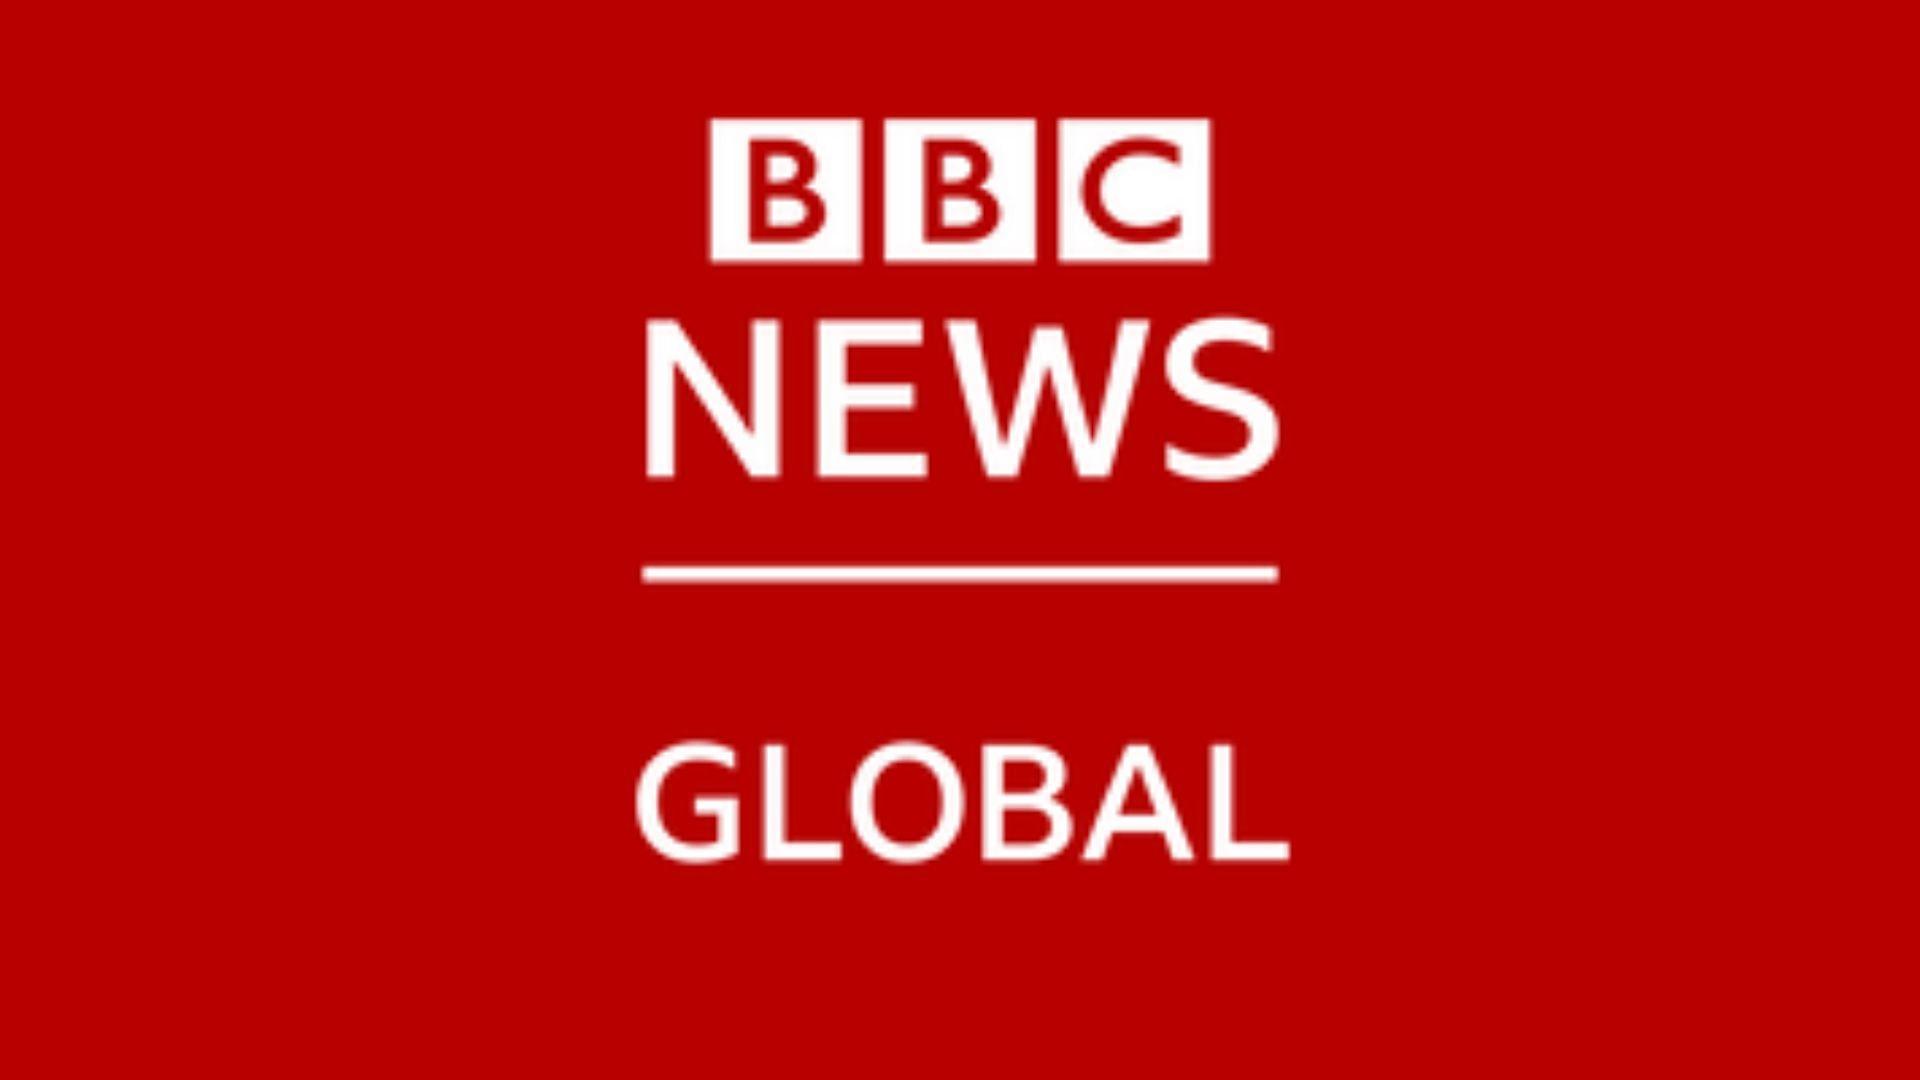 bbc news global?blur=25